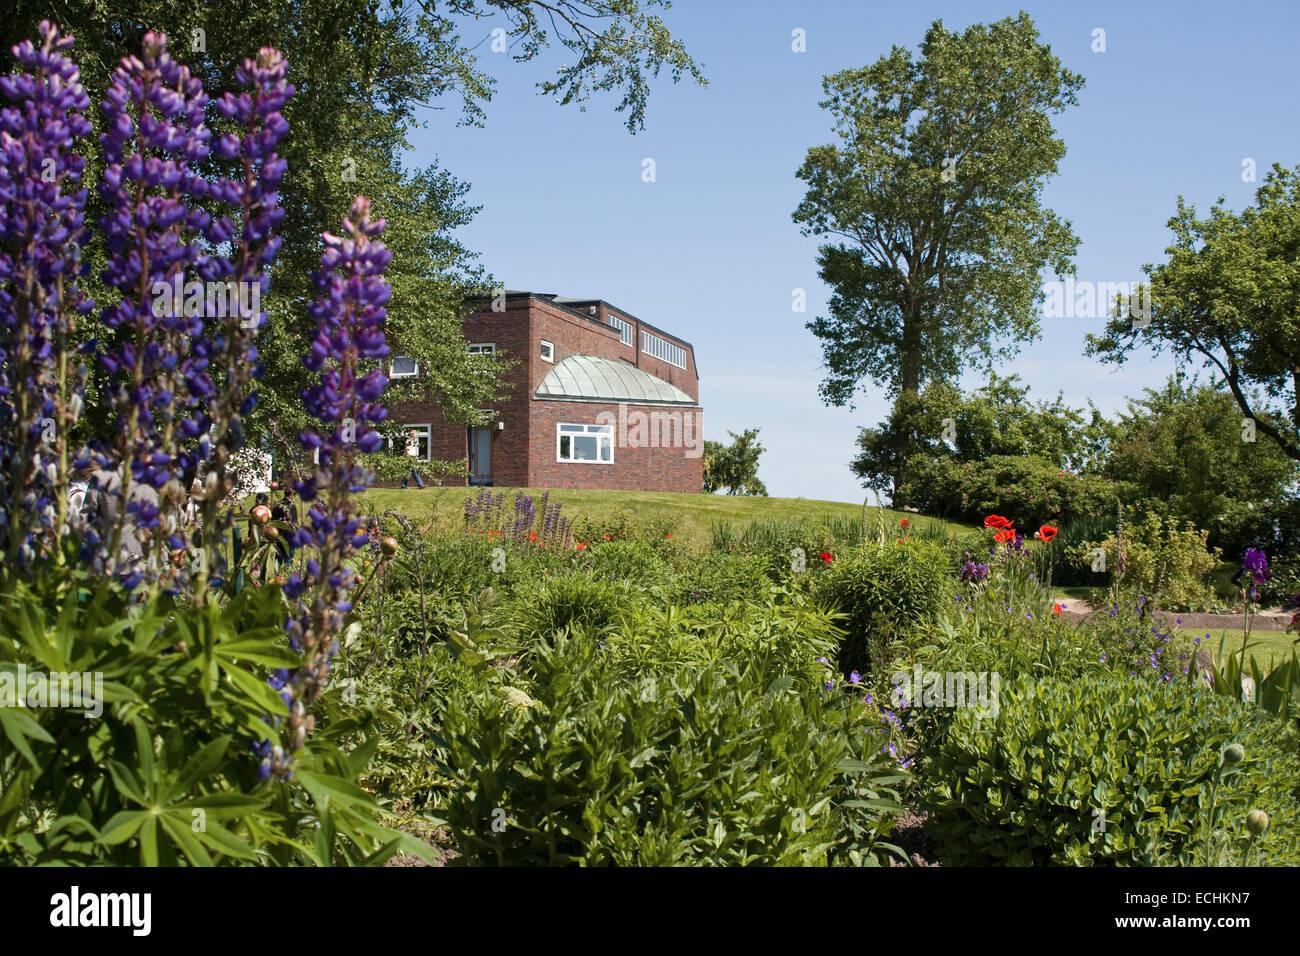 Europe, Germany, Schleswig Holstein, Neukirchen, Seebuell, Nolde Foundation, the Nolde Museum - Stock Image